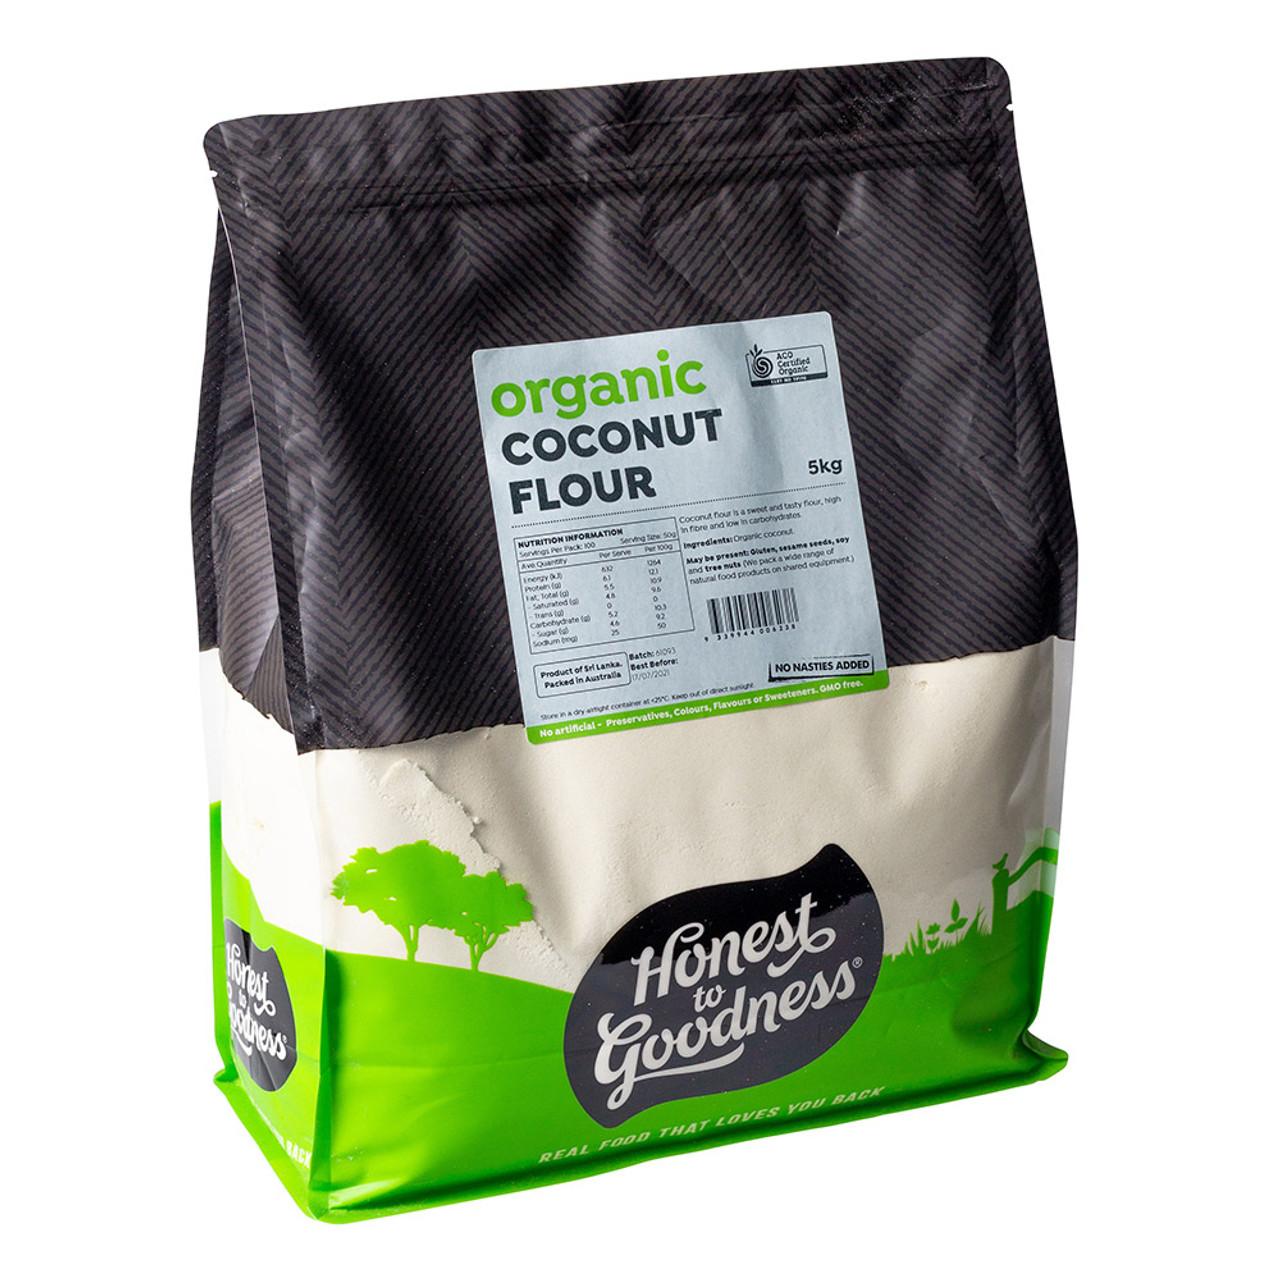 Organic Coconut Flour 5kg Gluten Free Bulk